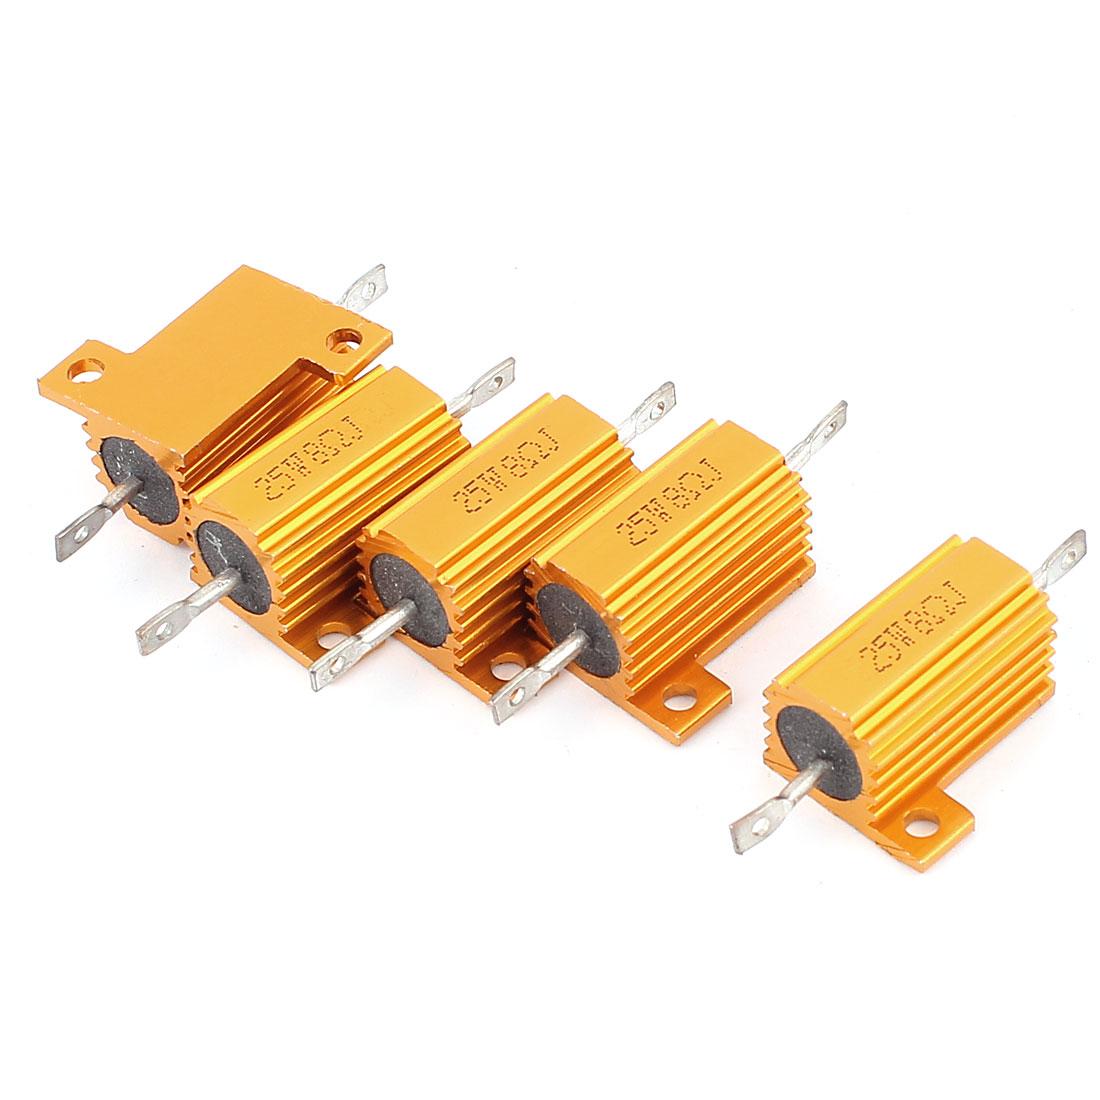 5 Pcs 25W 8 Ohm Wirewound Aluminium Housing Power Resistance Resistor